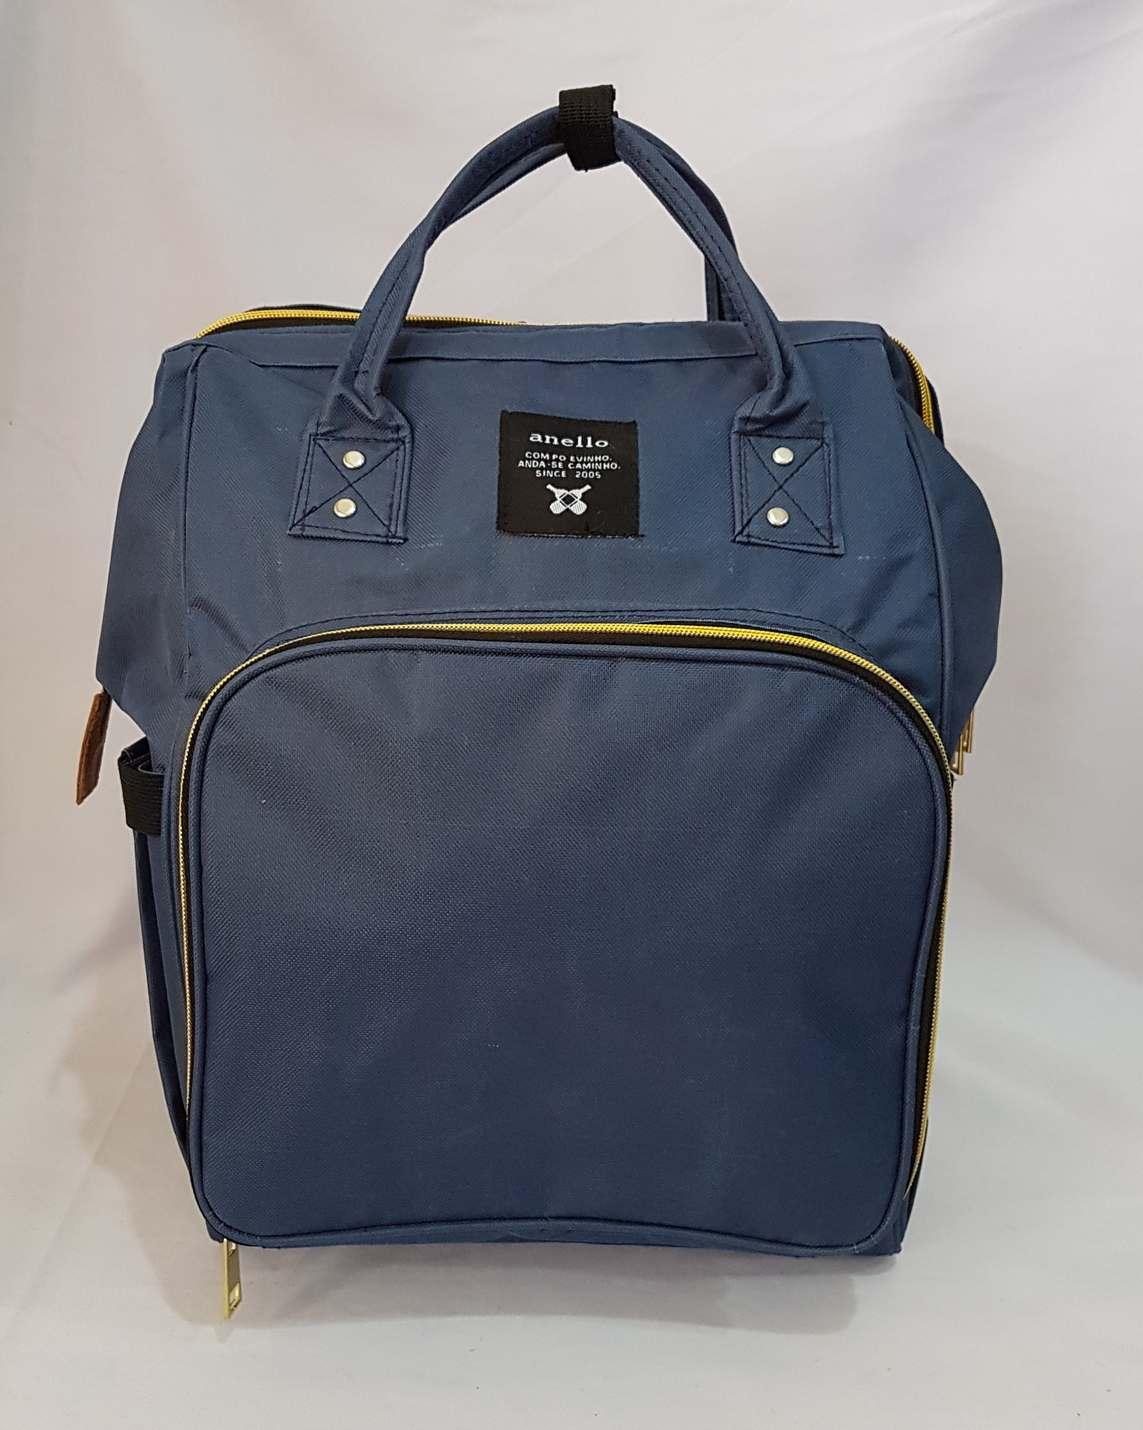 Tas Ransel Anello Diaper Bag / Tas Susu Bayi